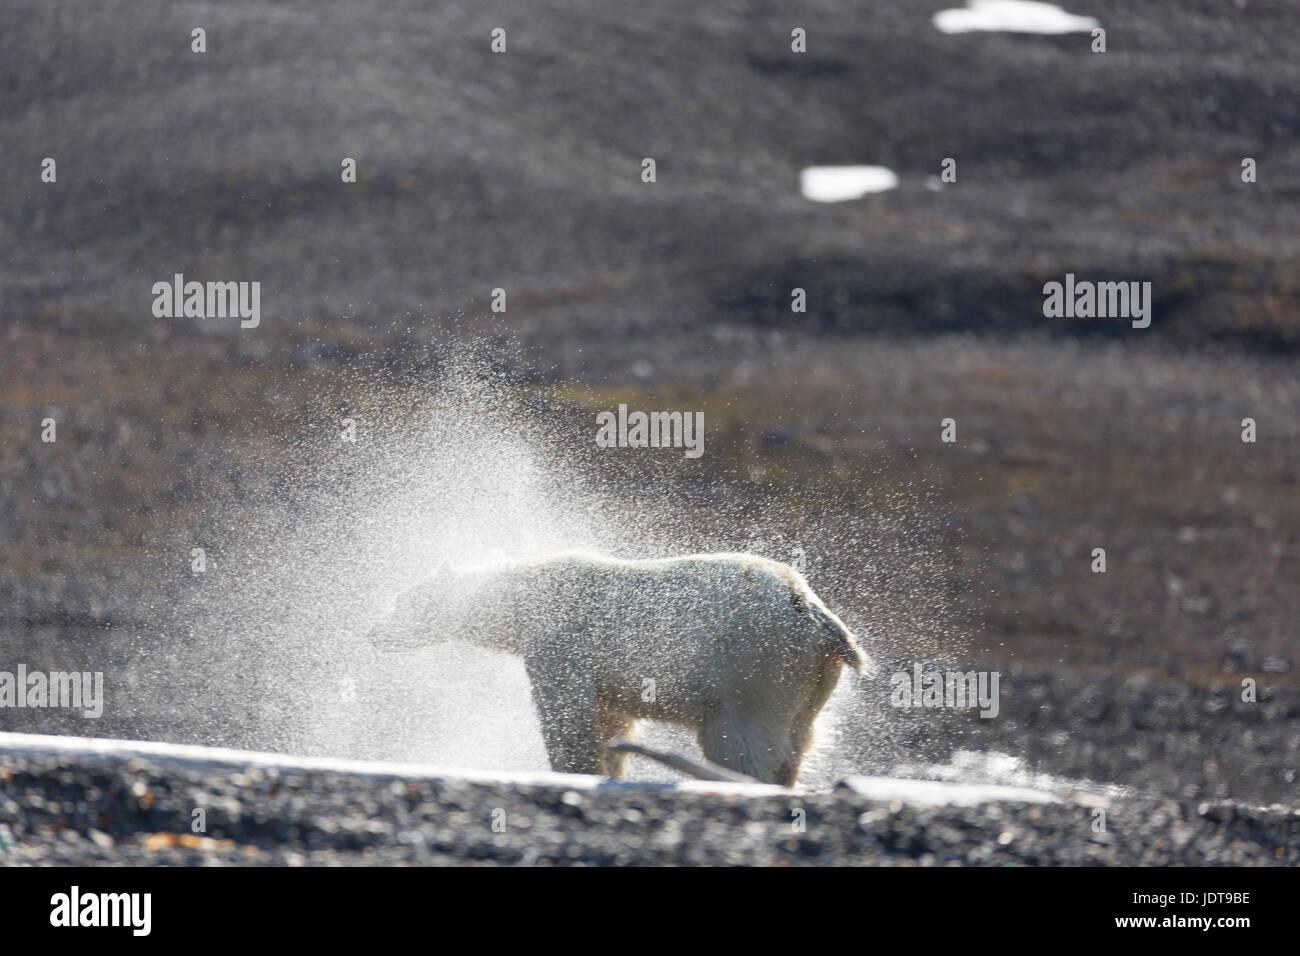 An adult polar bear shakes itself dry after walking ashore onto a shingle beach in Mushamna, Spitzbergen - Stock Image